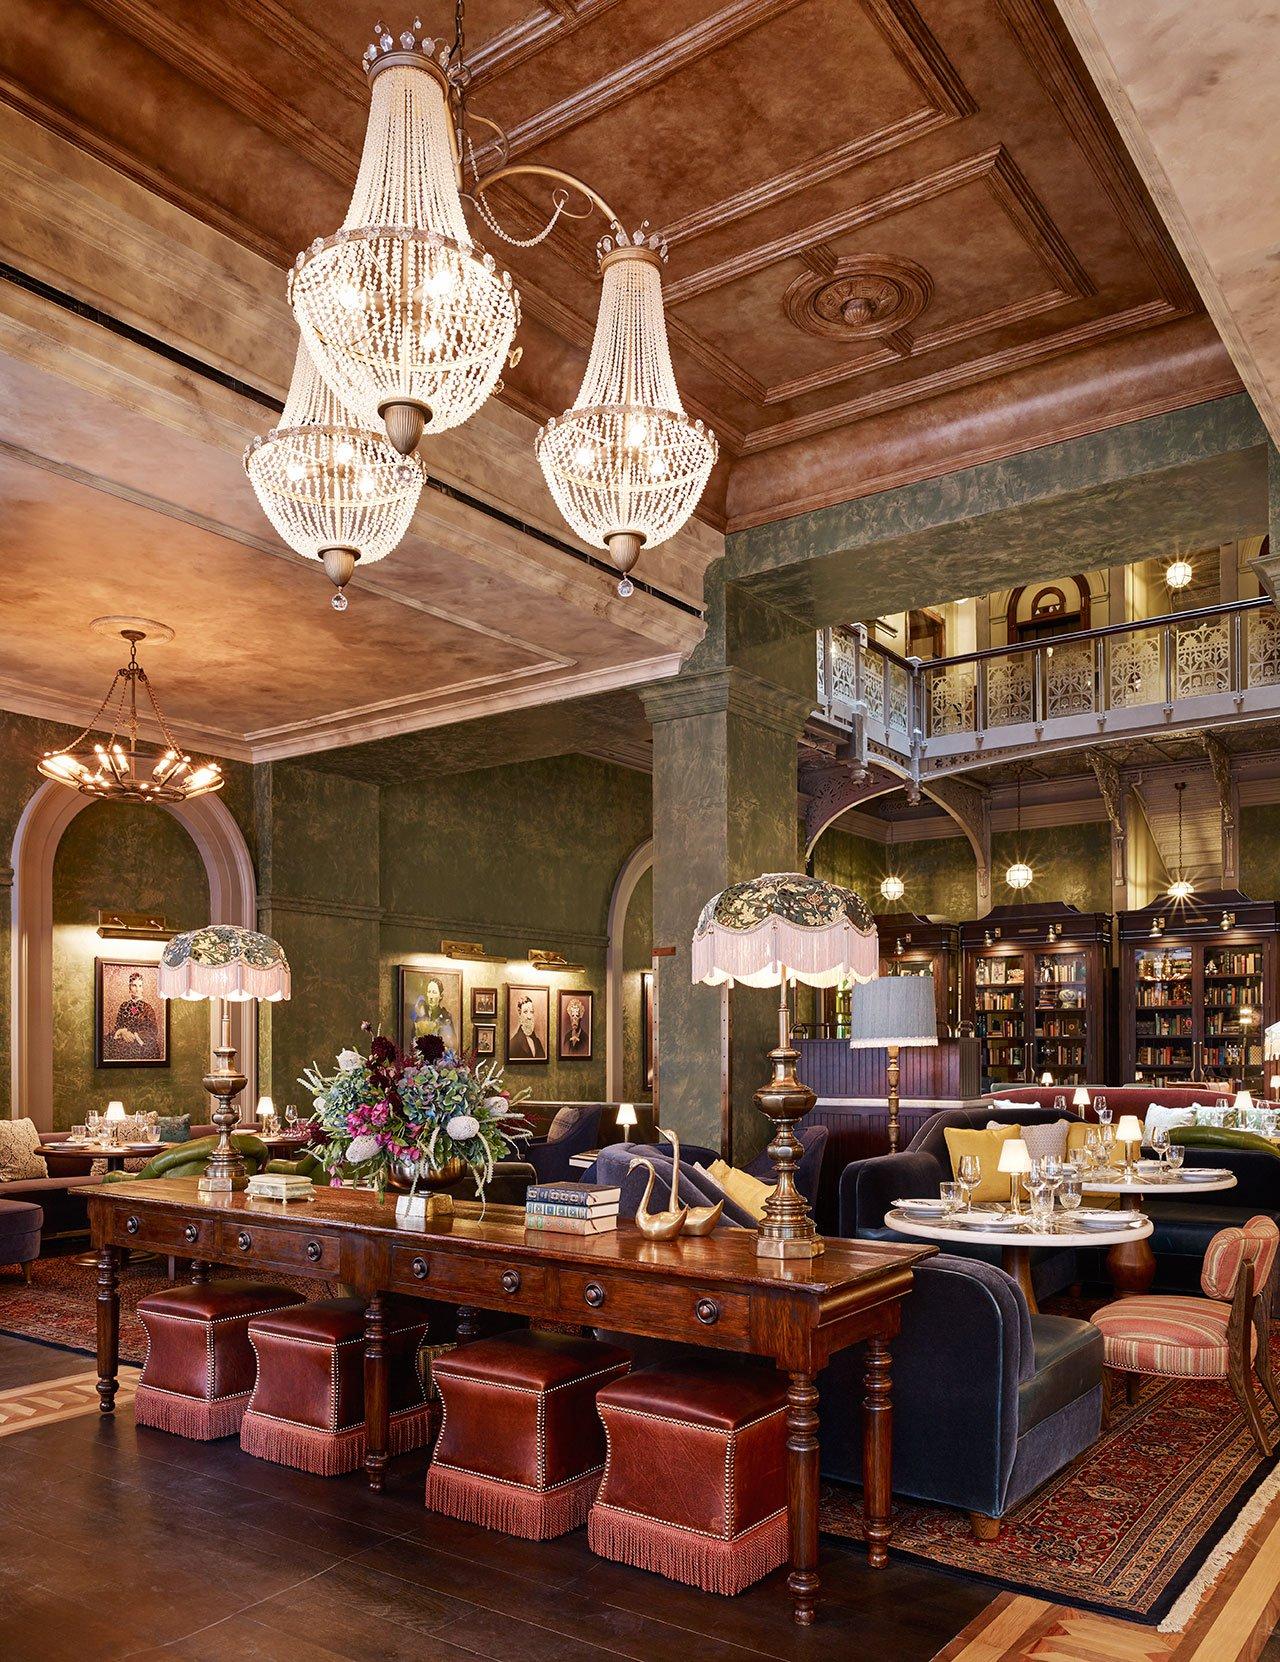 The_beekman_a_thompson_hotel_new_york_yatzer_martin Brudnizki, Mandy Stool  By Koket, Luxury Furniture Manhattan Hotel Historic NYC Building Revival